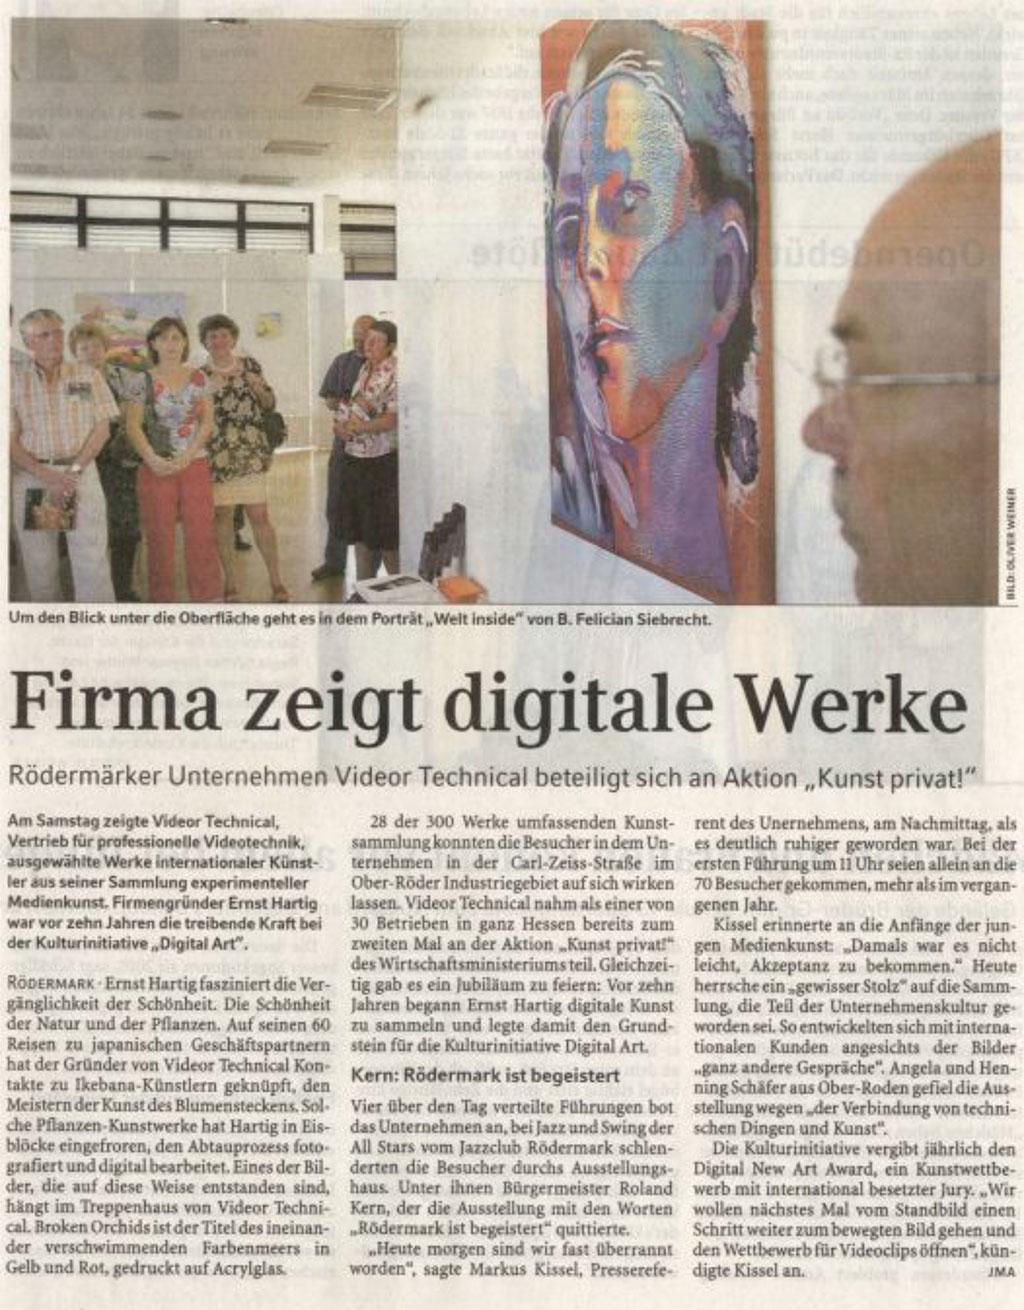 Kunst privat!, Firma zeigt digitale Werke, Frankfurter Rundschau 03.07.2006